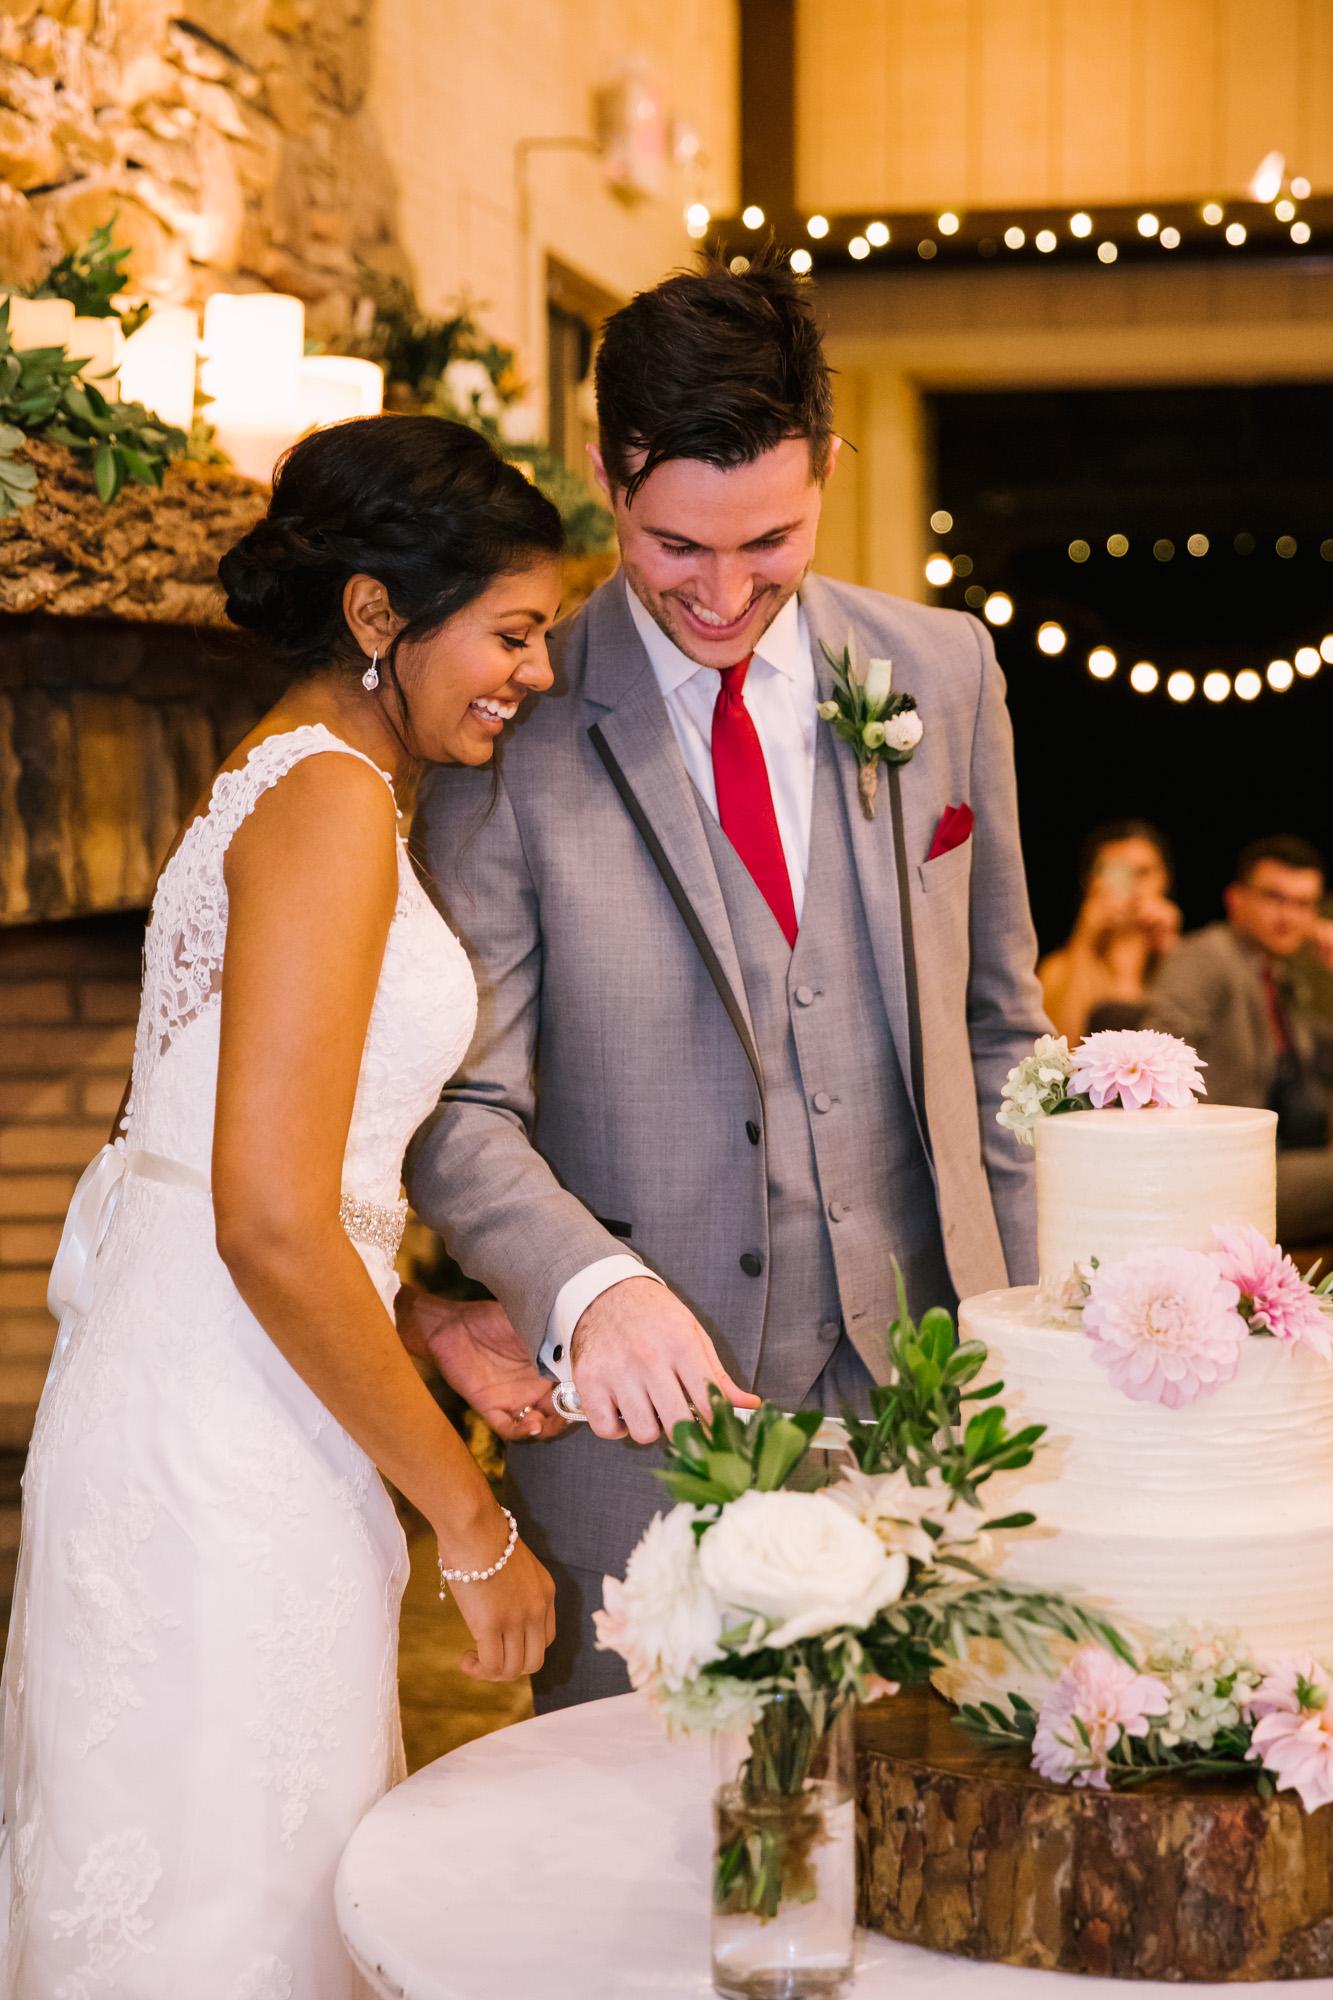 Waynesville NC Wedding Photography | Bride and Groom Cut Cake